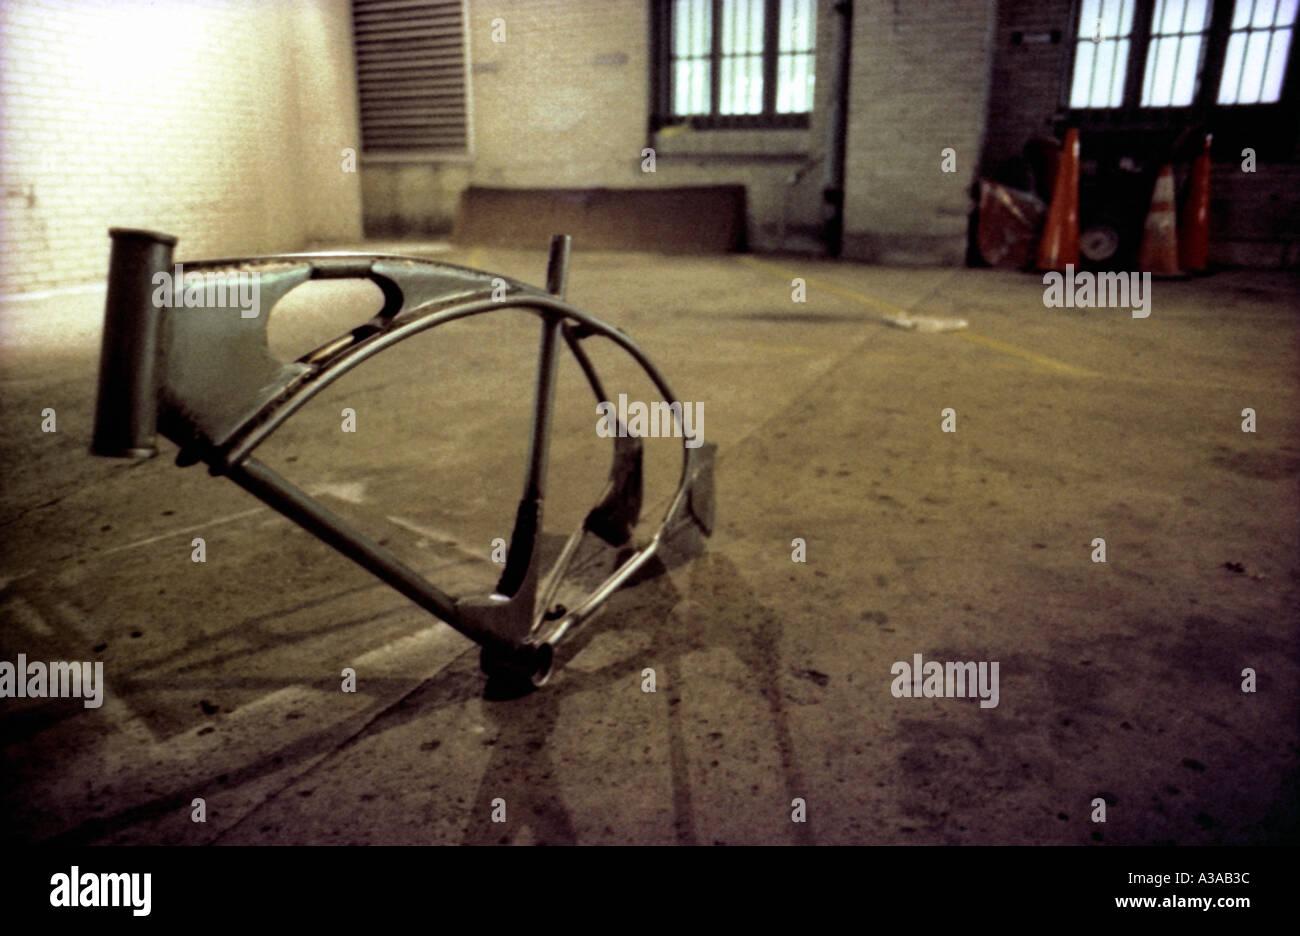 lowrider bike frame Stock Photo: 240444 - Alamy